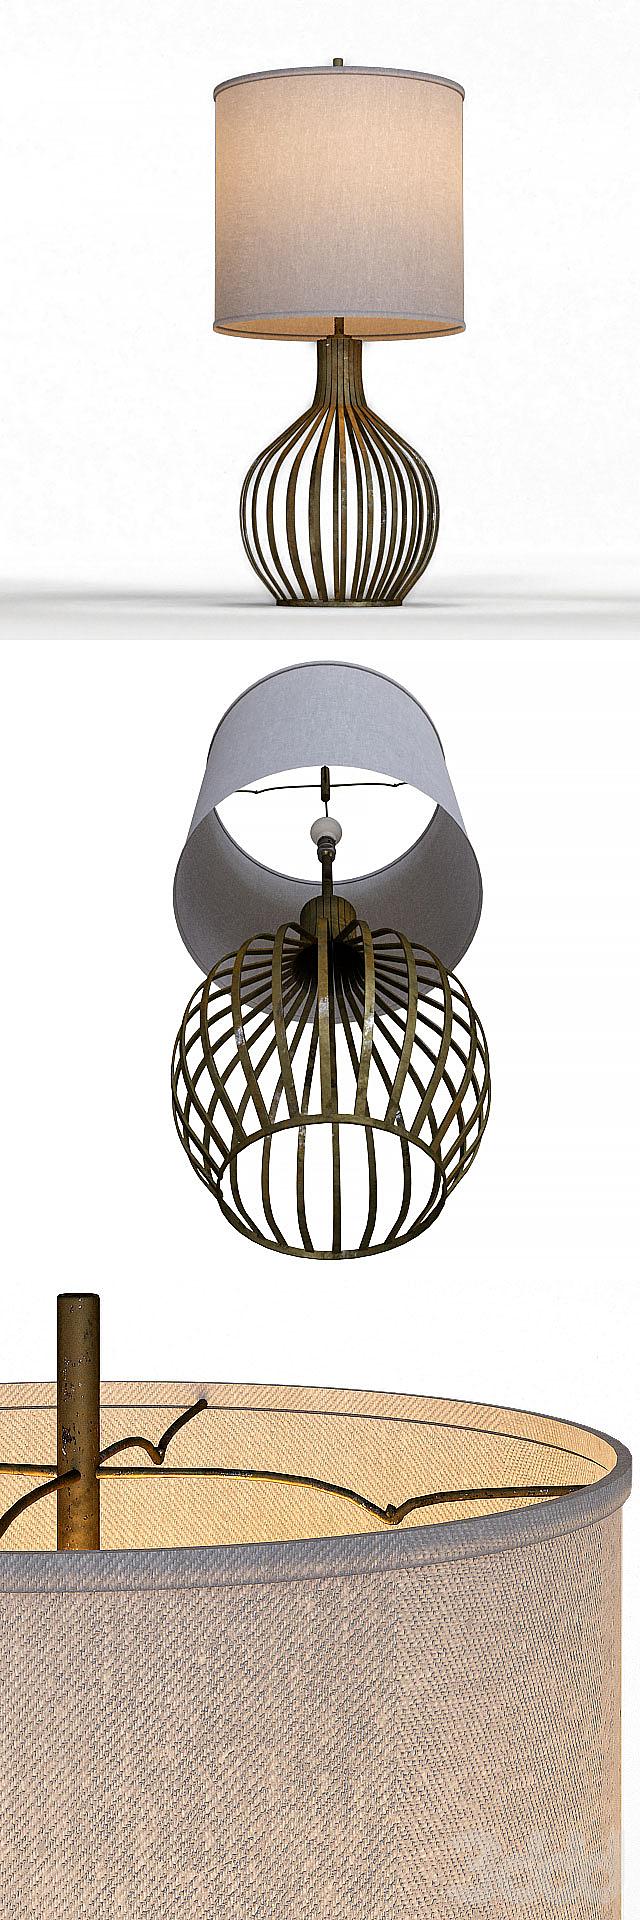 "Bast 31"" Table Lamp"